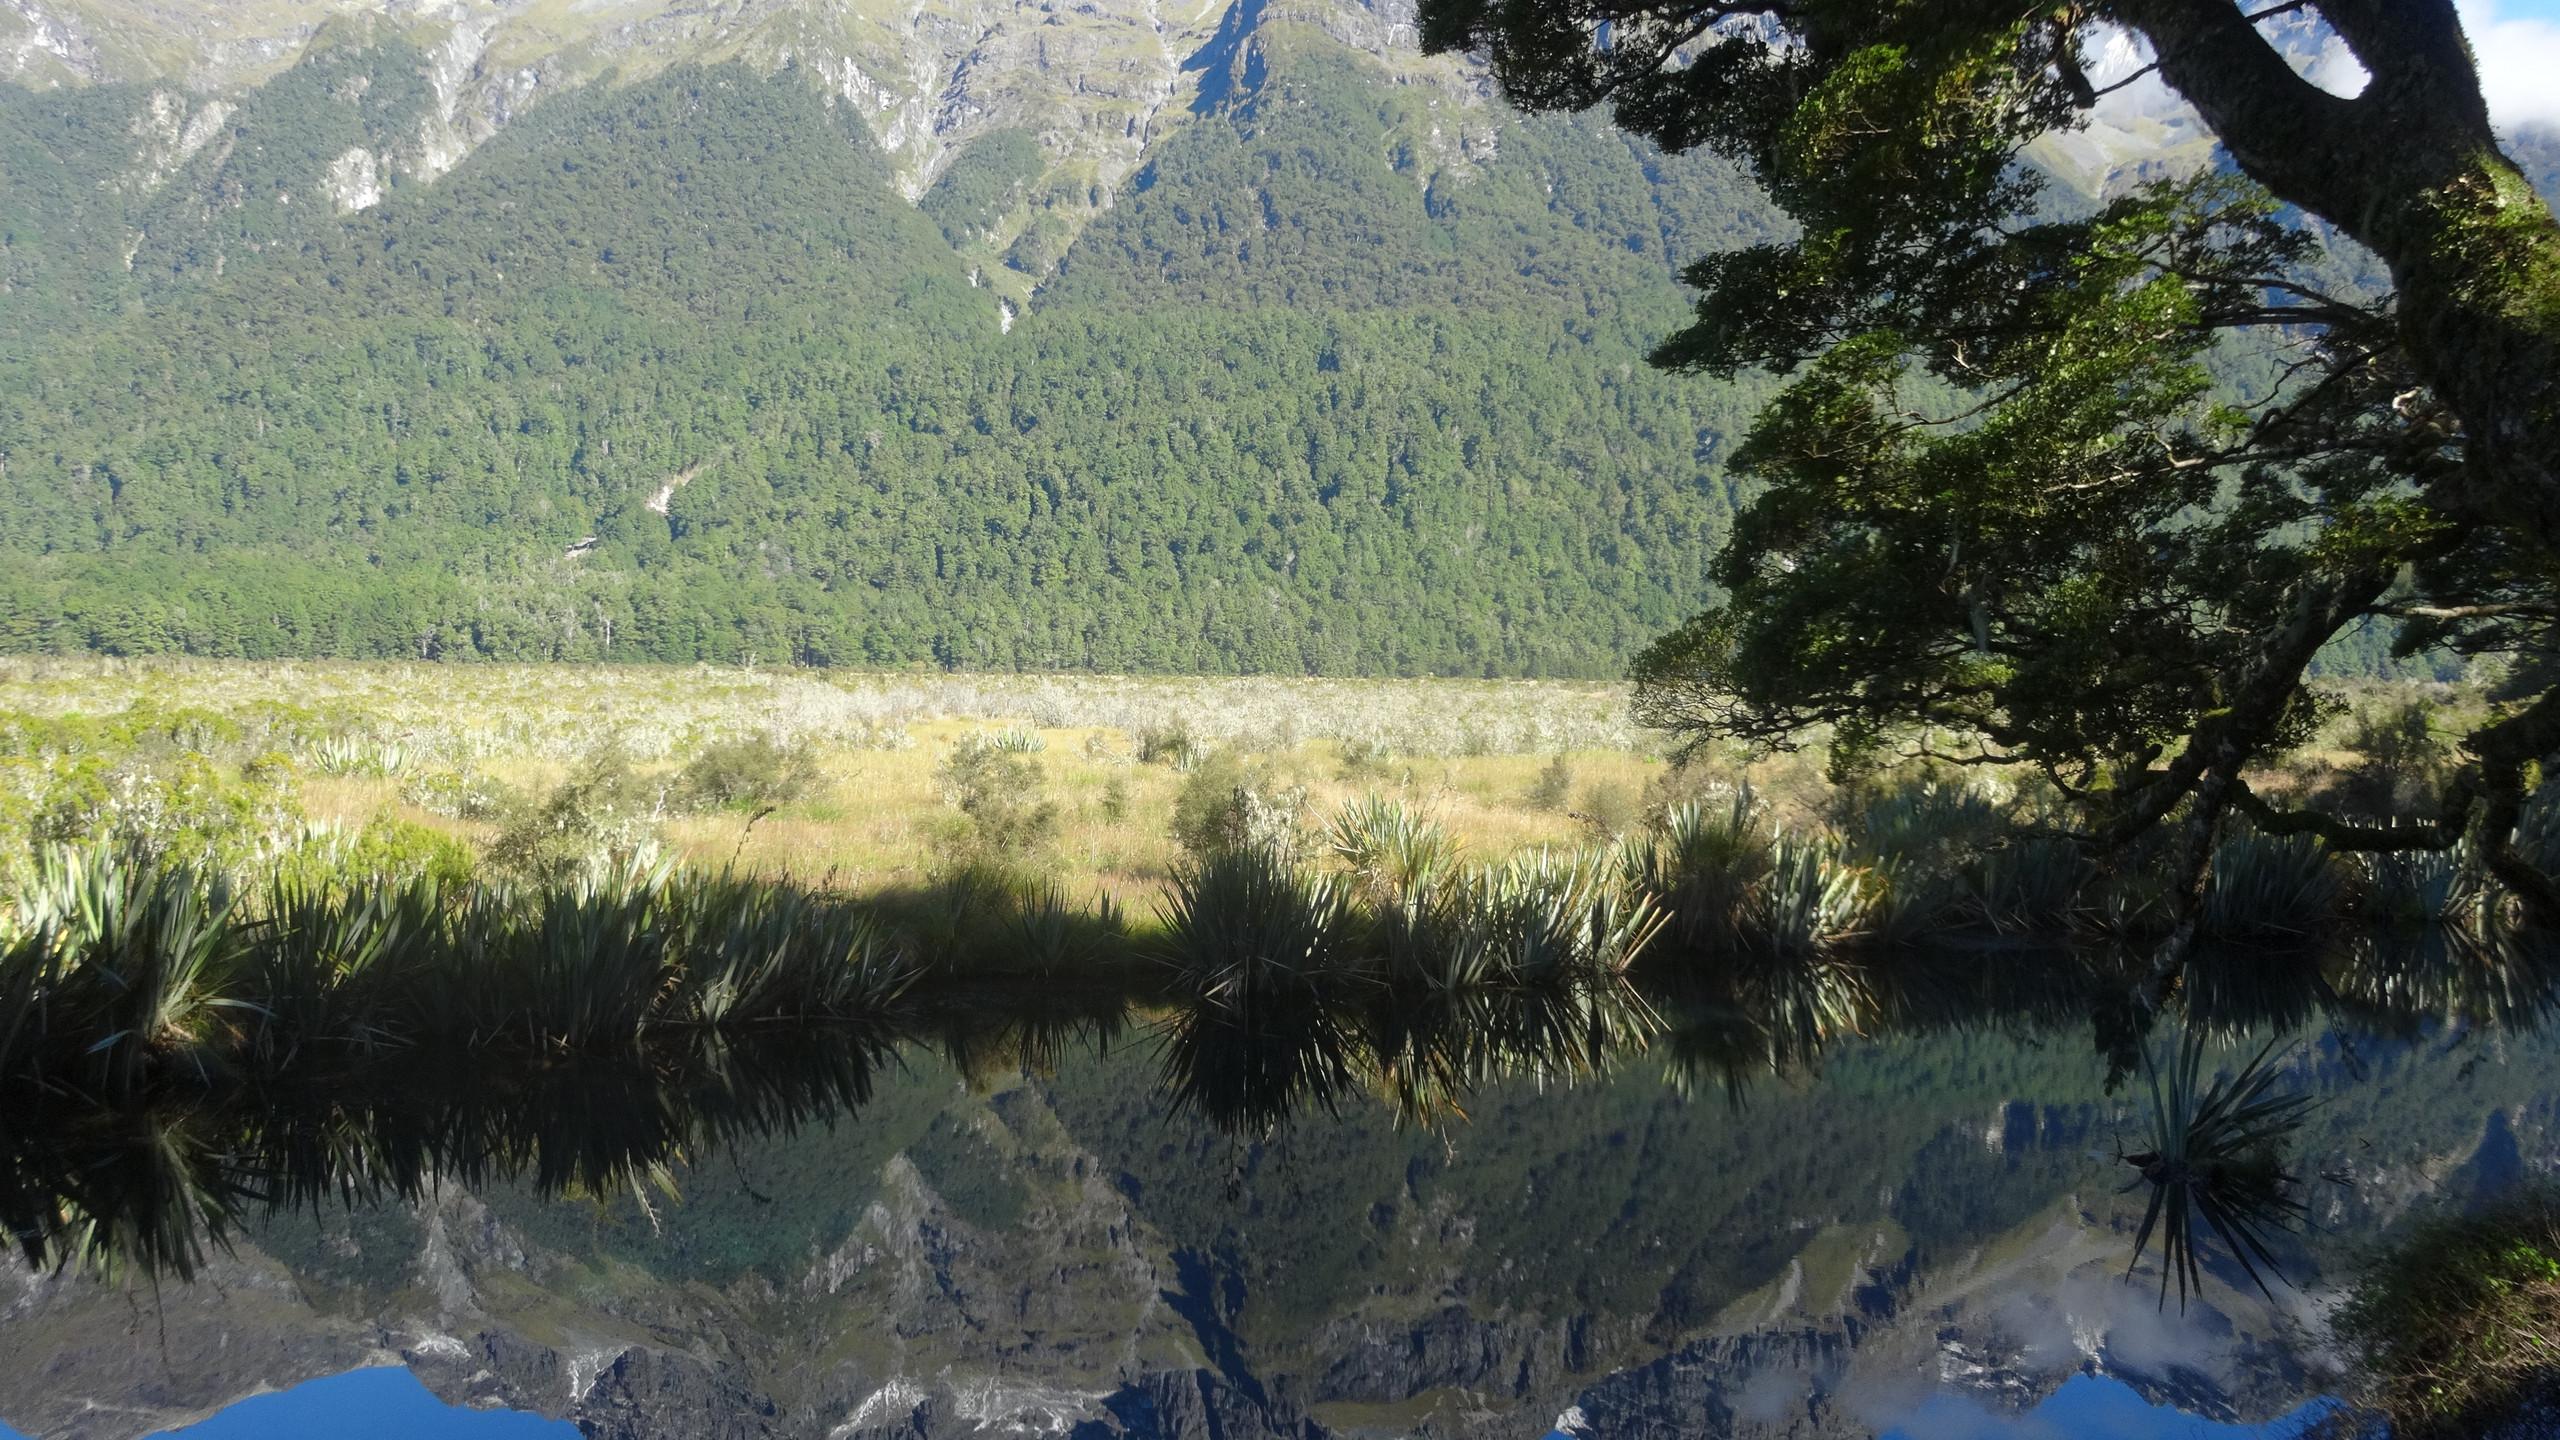 Mirrow lake in Fiordland National Park New Zealand